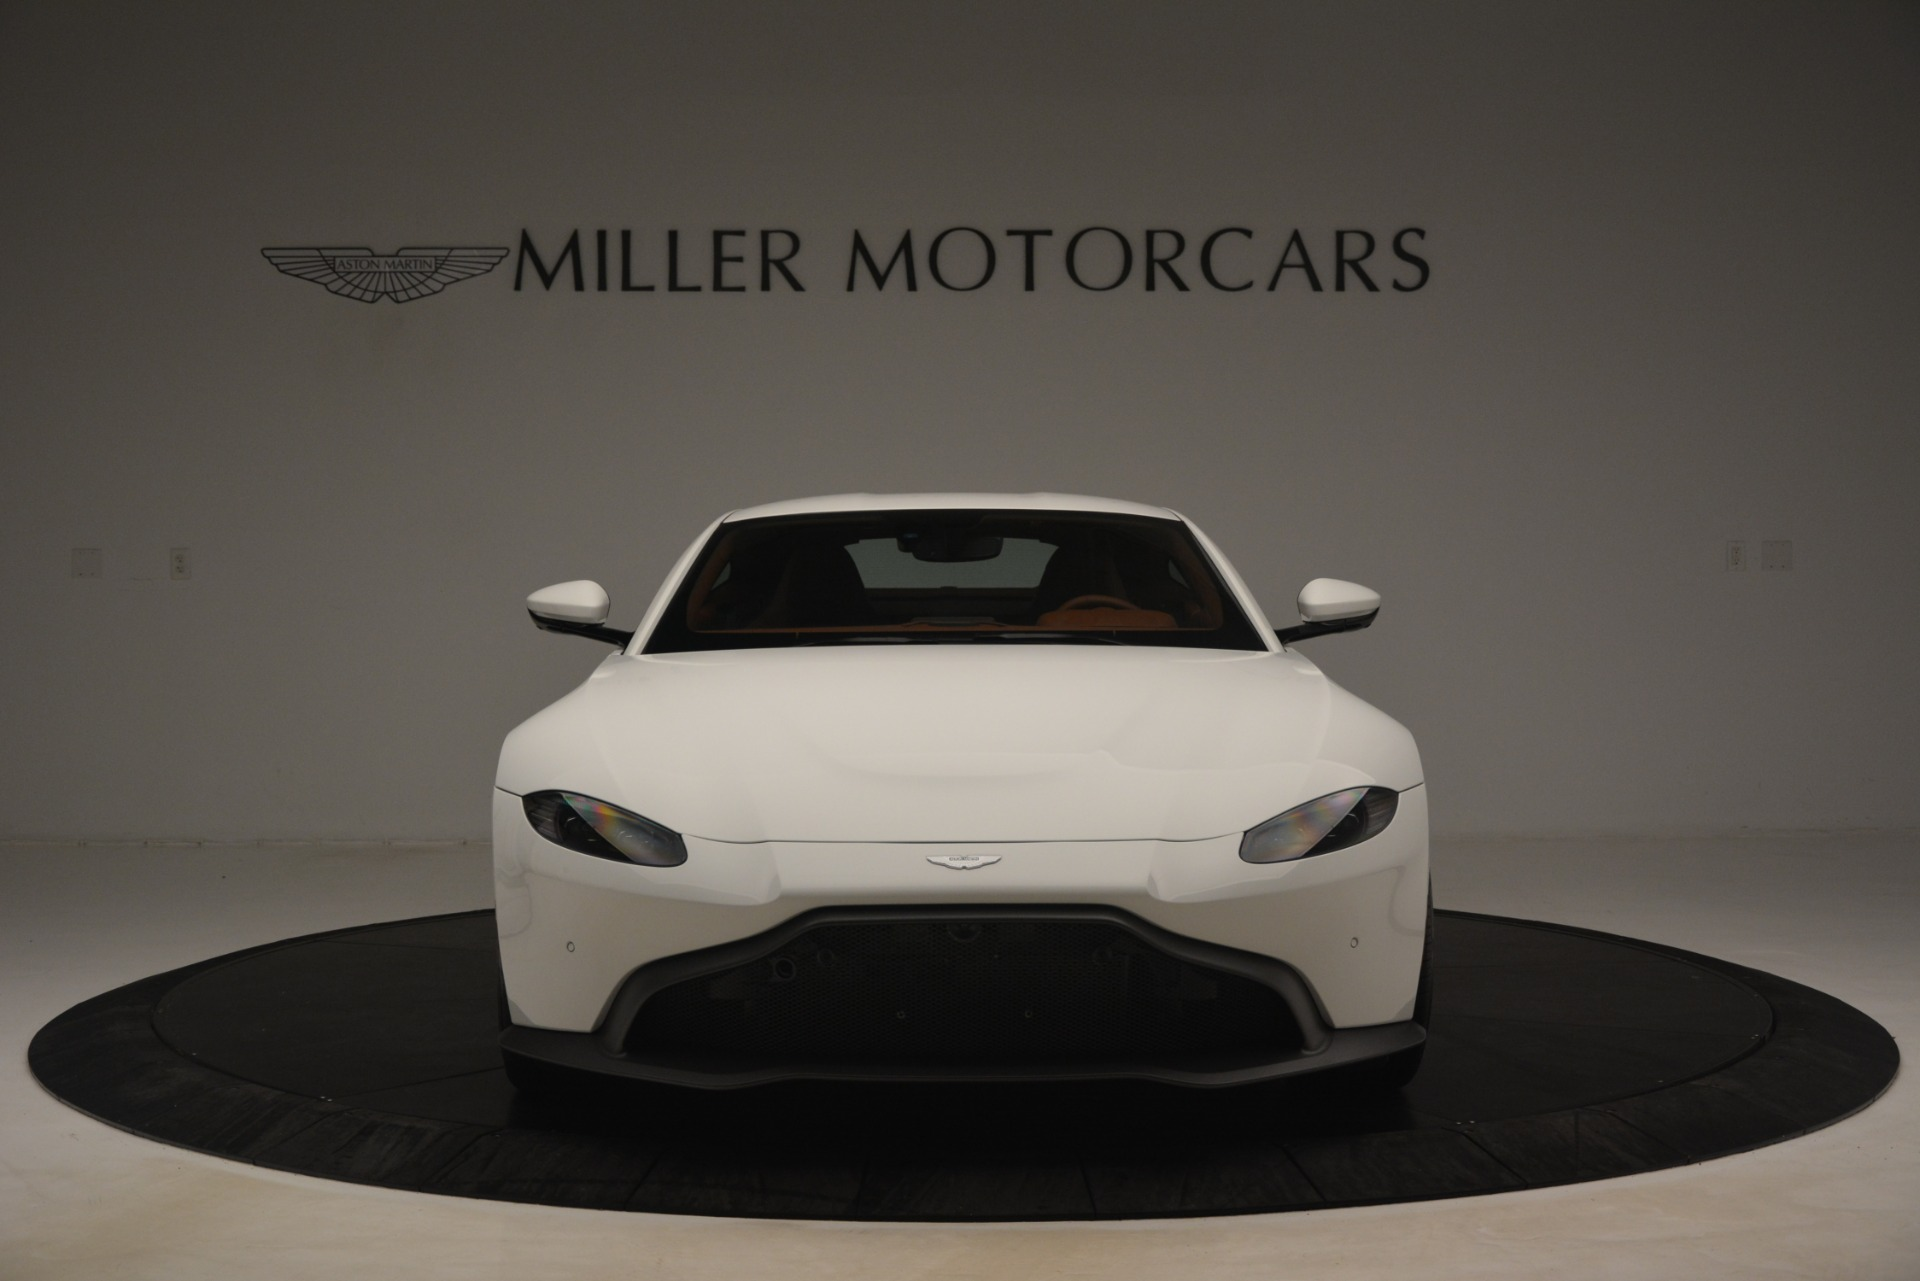 New 2019 Aston Martin Vantage Coupe For Sale In Greenwich, CT. Alfa Romeo of Greenwich, A1373 3227_p11